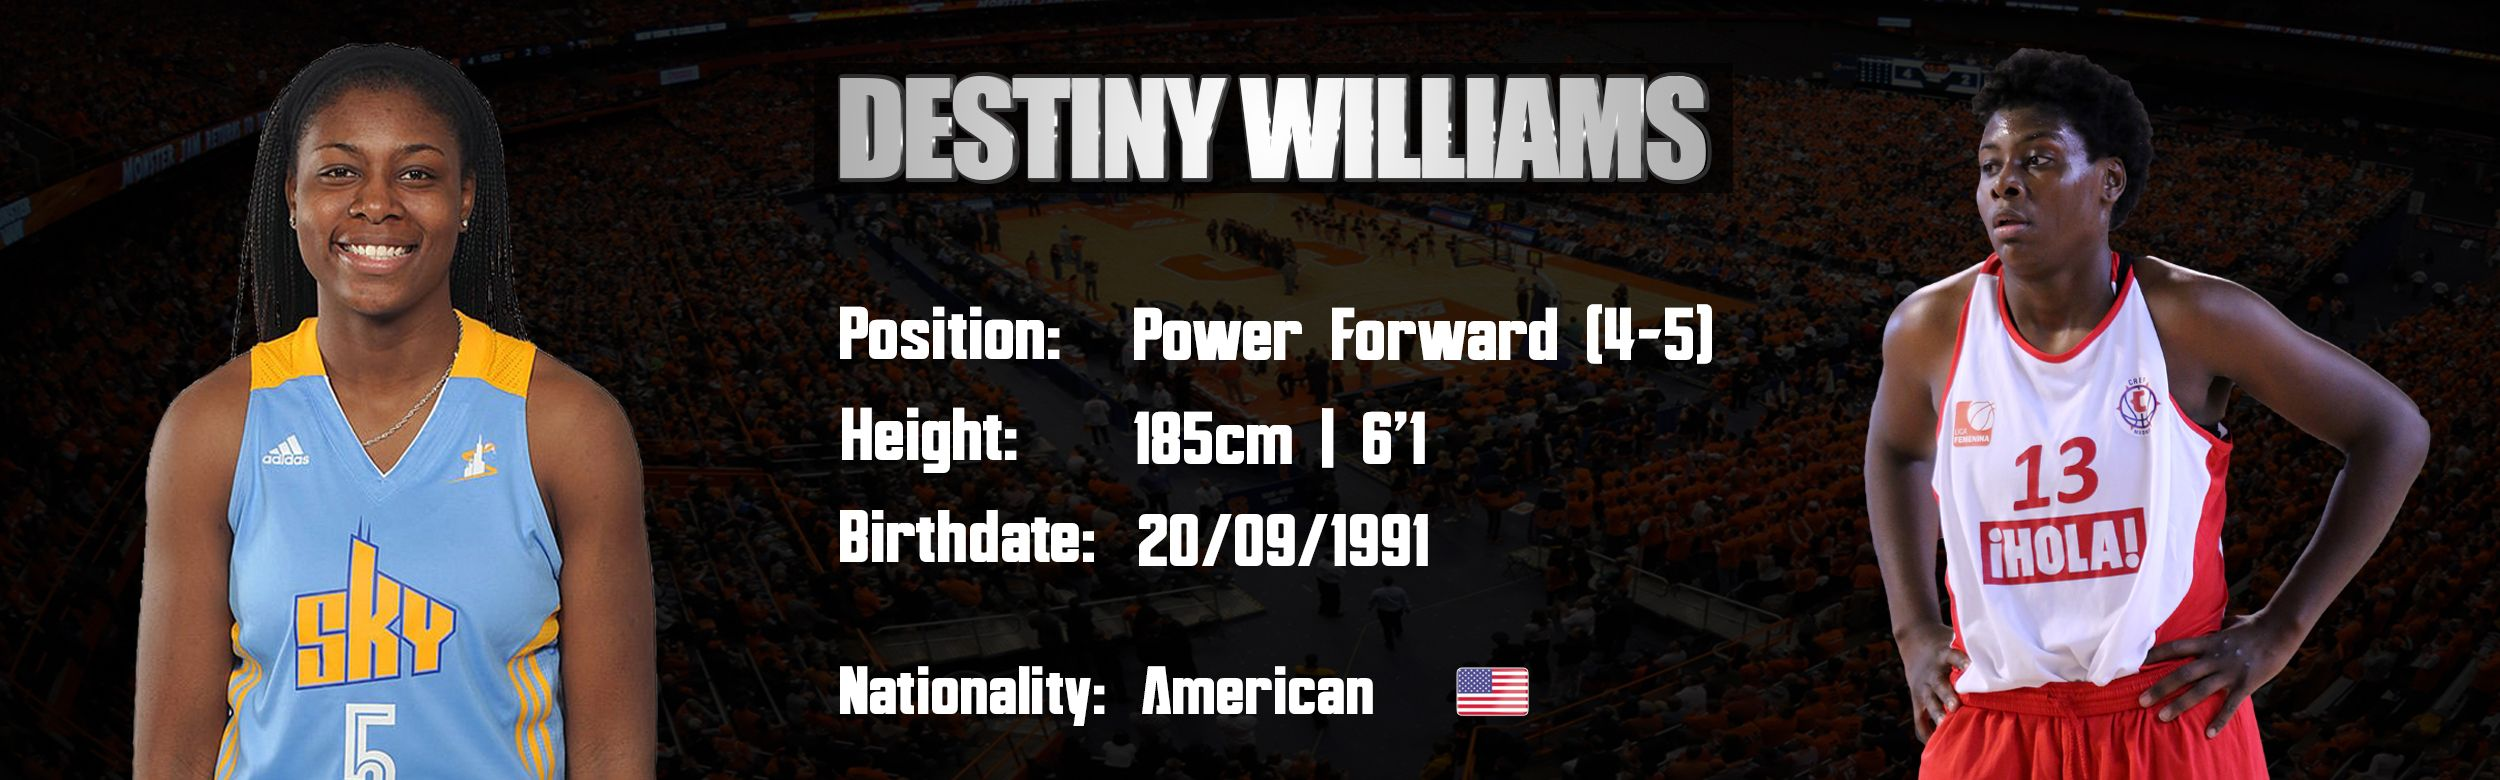 Destiny Williams